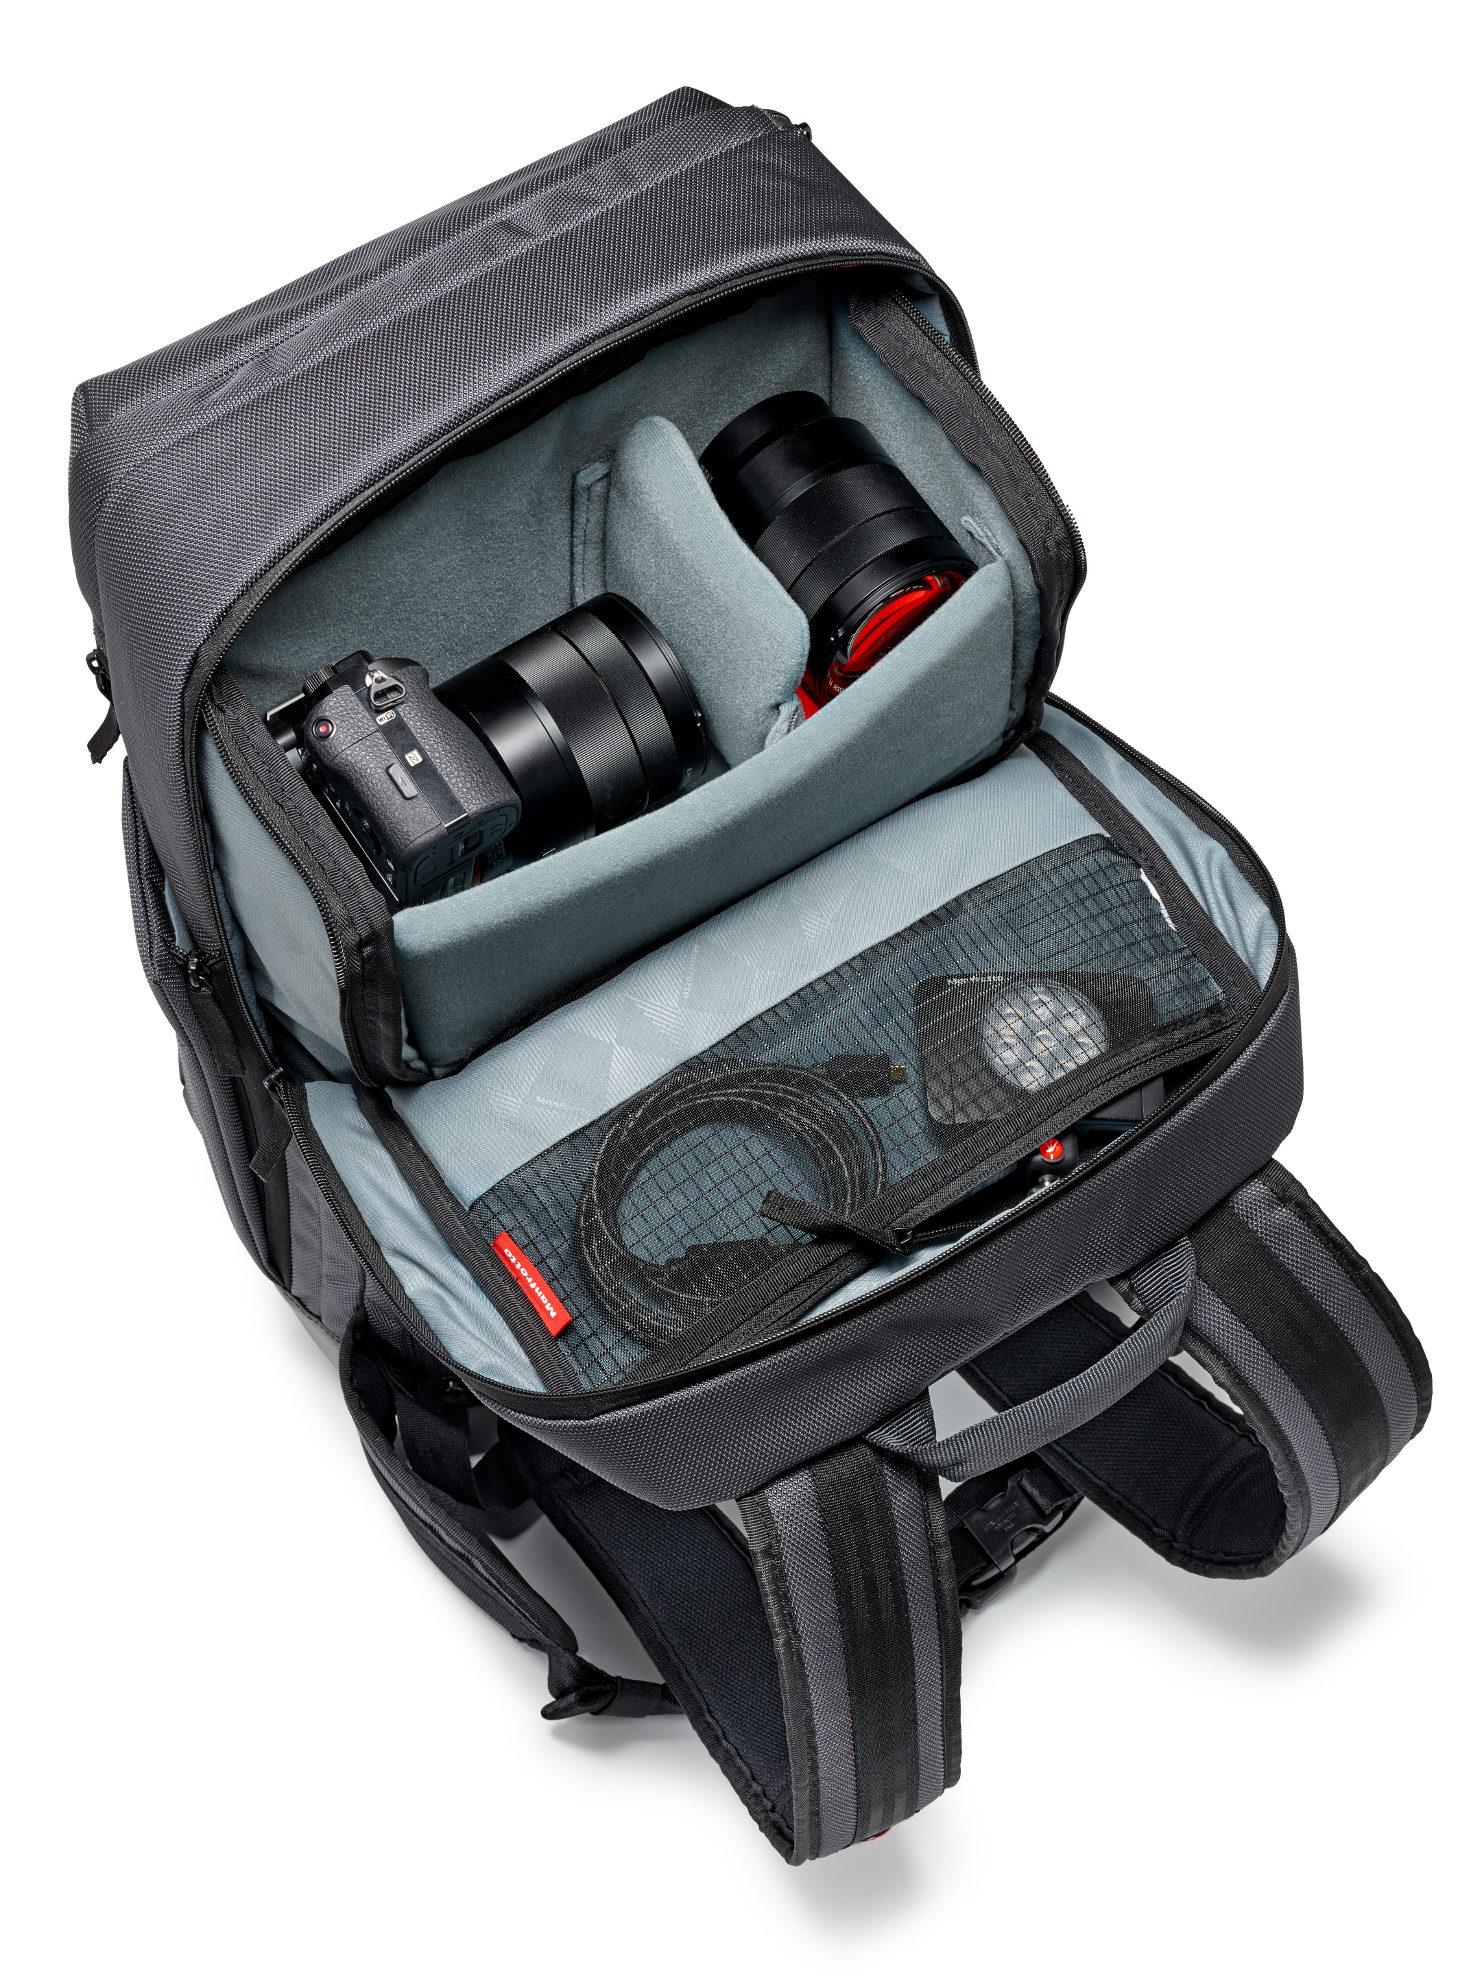 Manfrotto MB MN-BP-MV-50 Manhattan Mover-50 Camera Backpack MB-MN-BP-MV-50